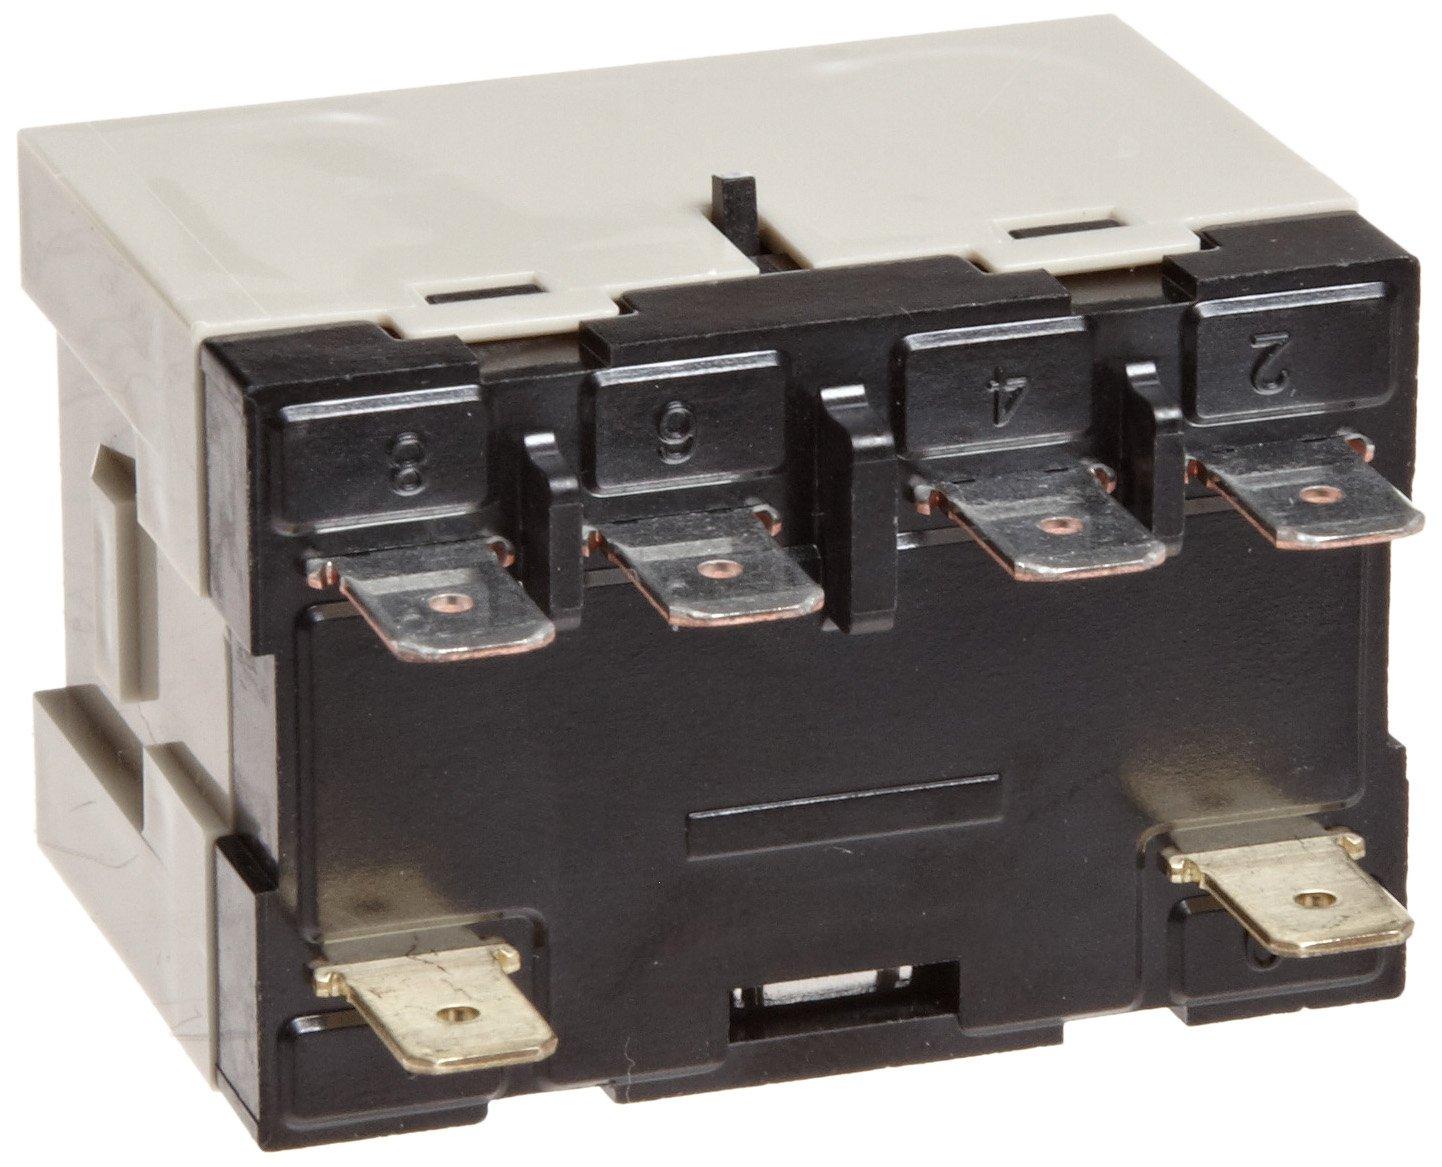 Omron G7l 2a T J Cb Ac100 120 General Purpose Relay With Test Button Hayward Goldline Aqualogic Main Printed Circuit Board Glxpcbmain Class B Insulation Quickconnect Terminal E Bracket Mounting